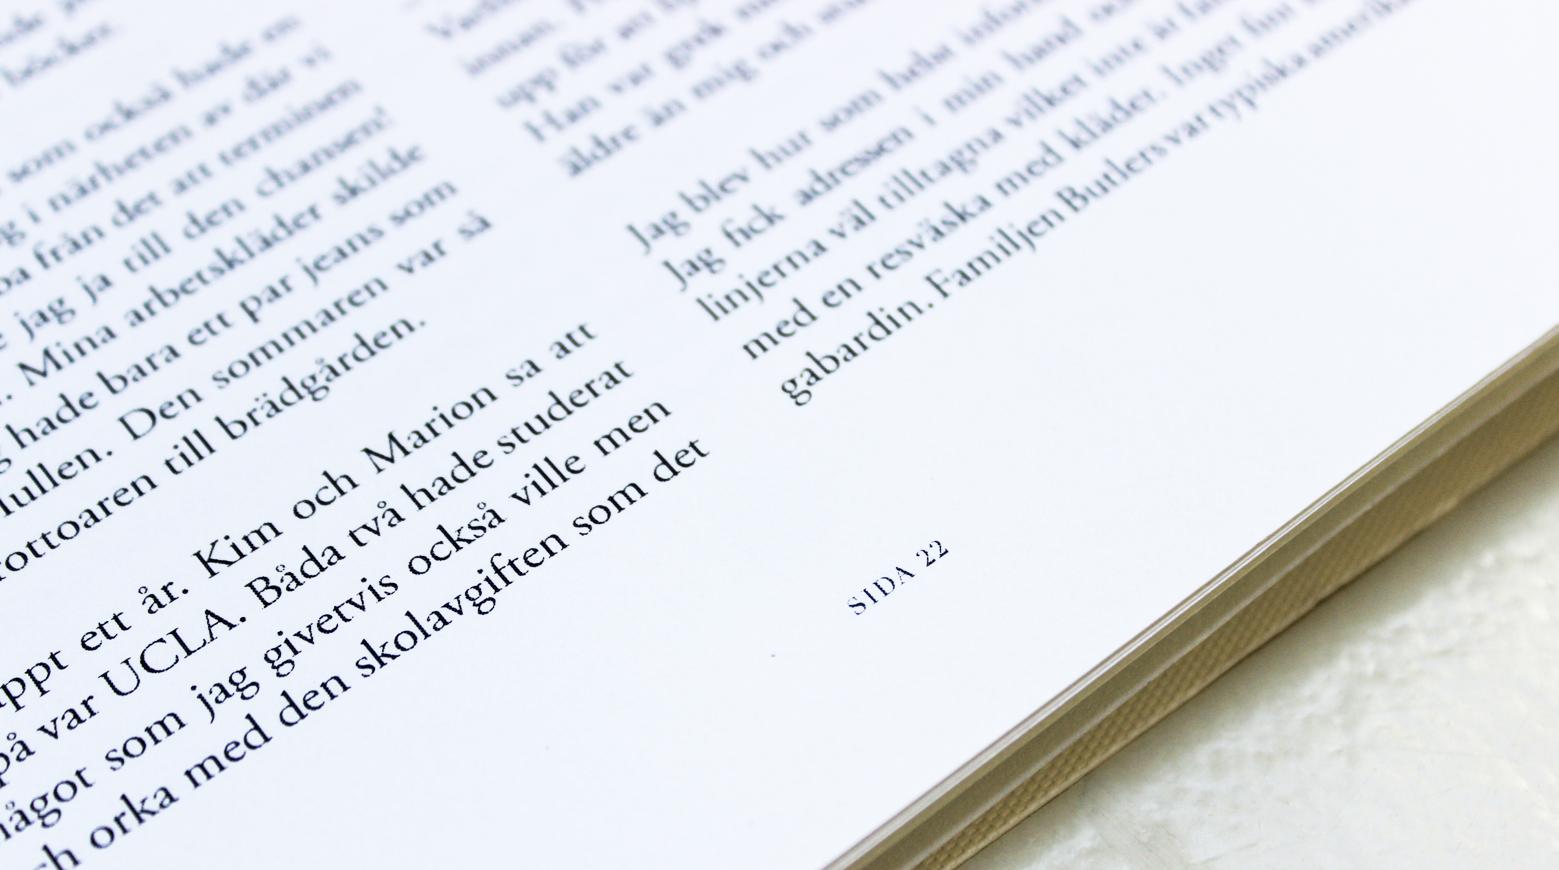 Moffa_5.jpg